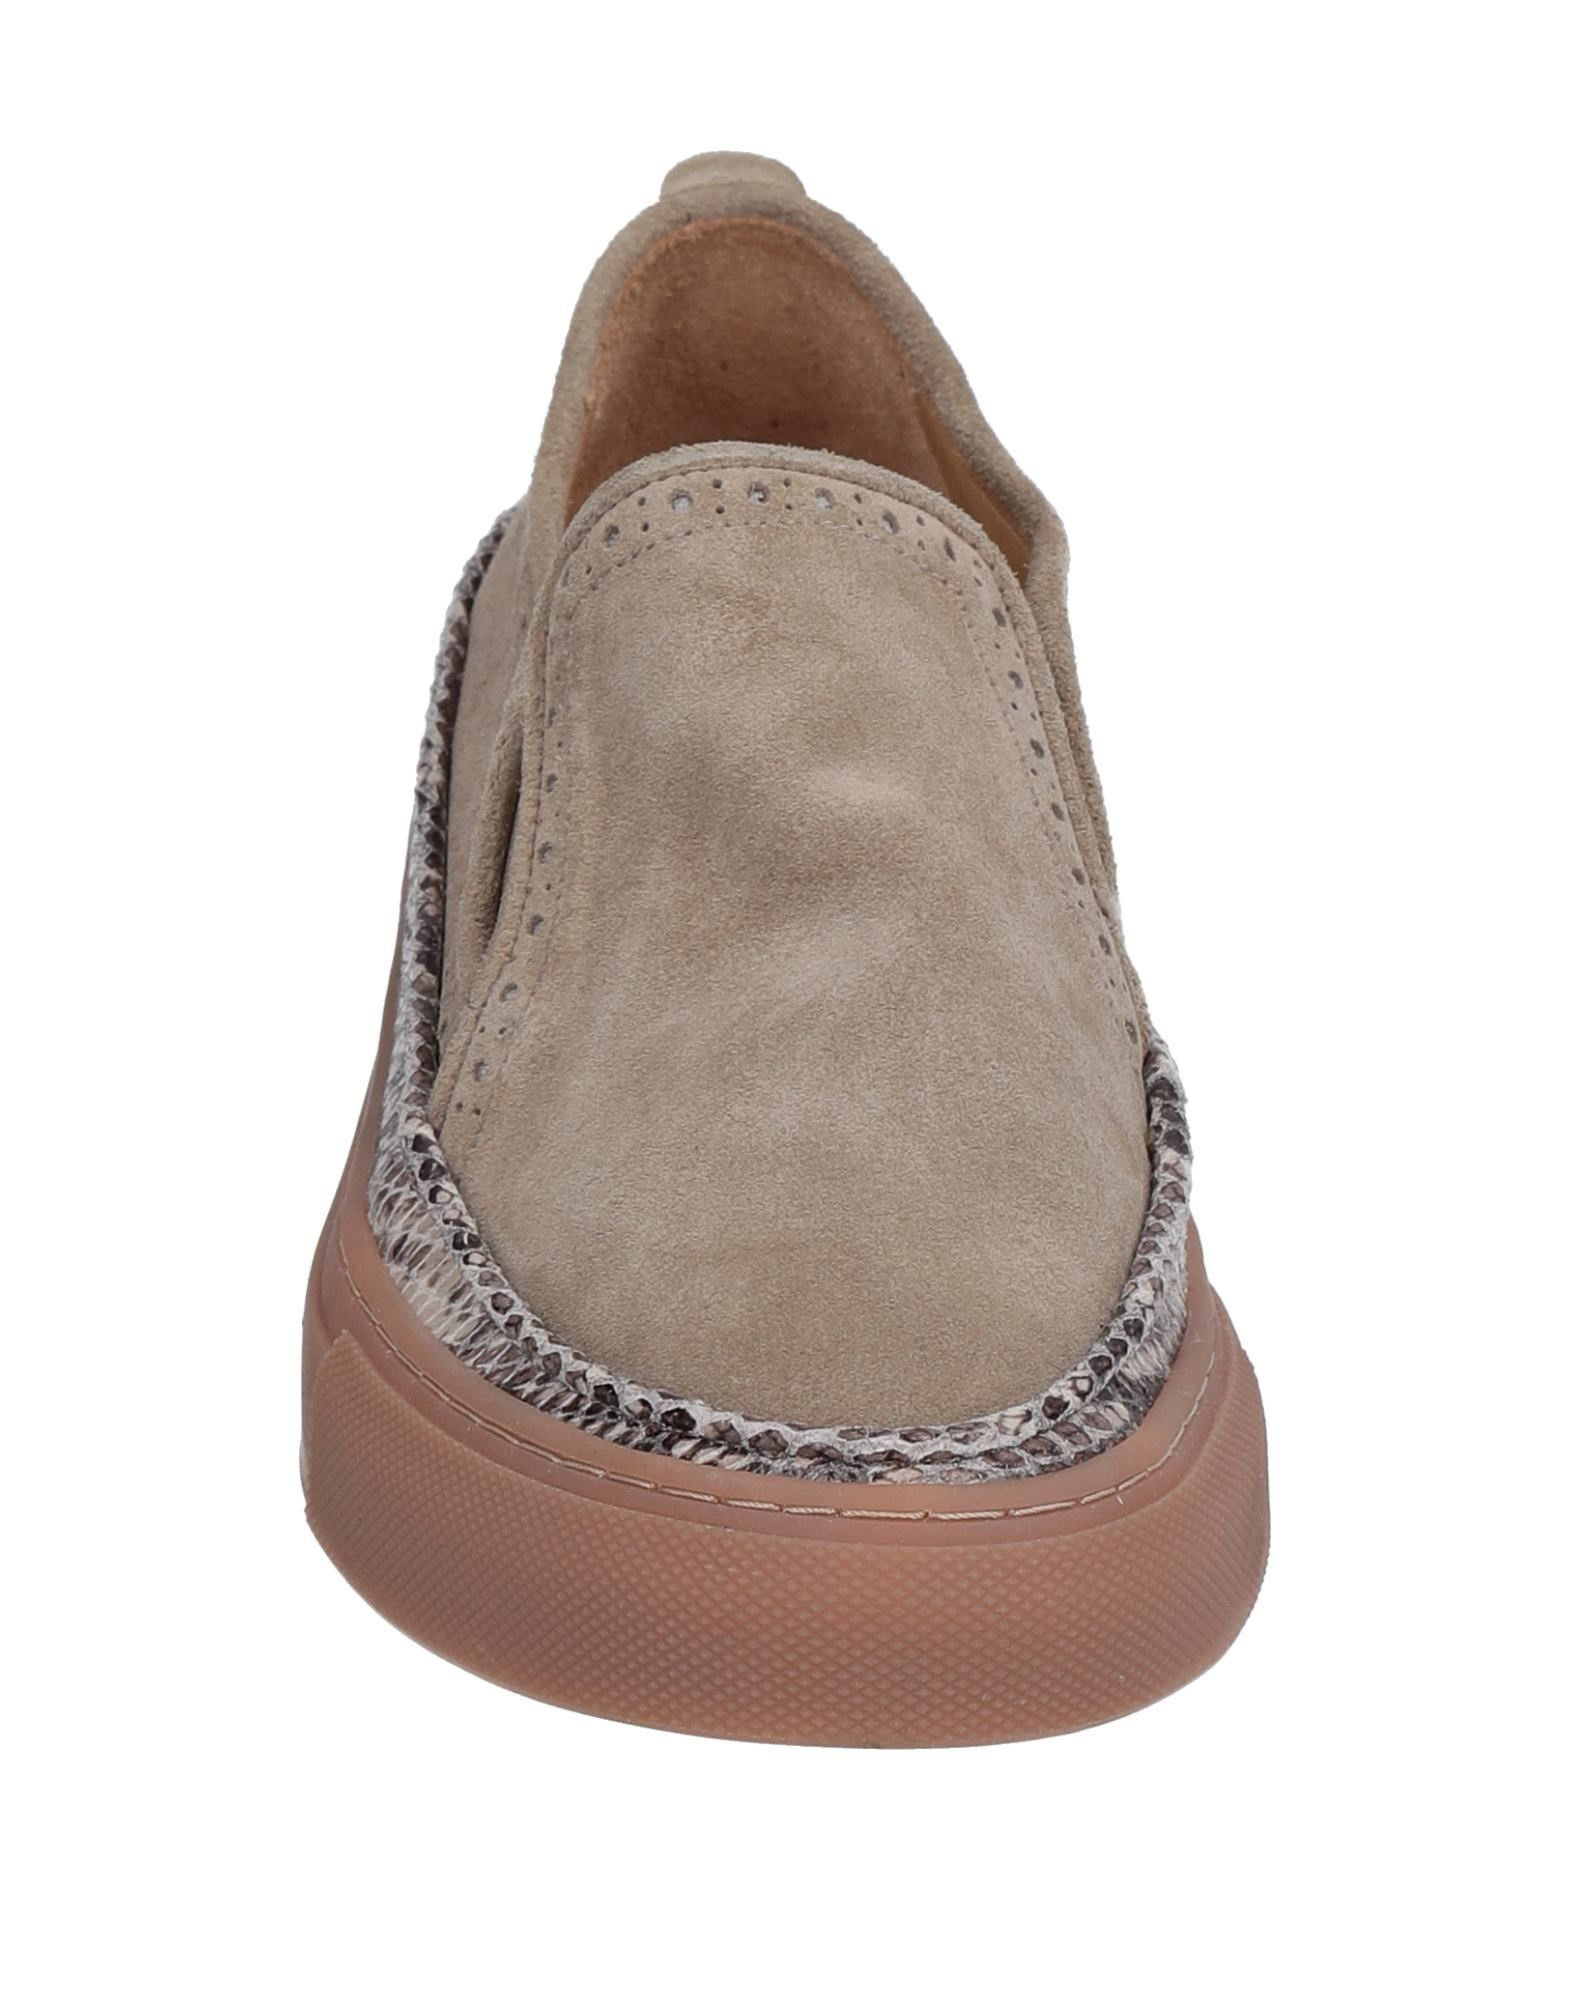 N.D.C. Made By Hand Sneakers Damen  11525985HE Heiße Schuhe